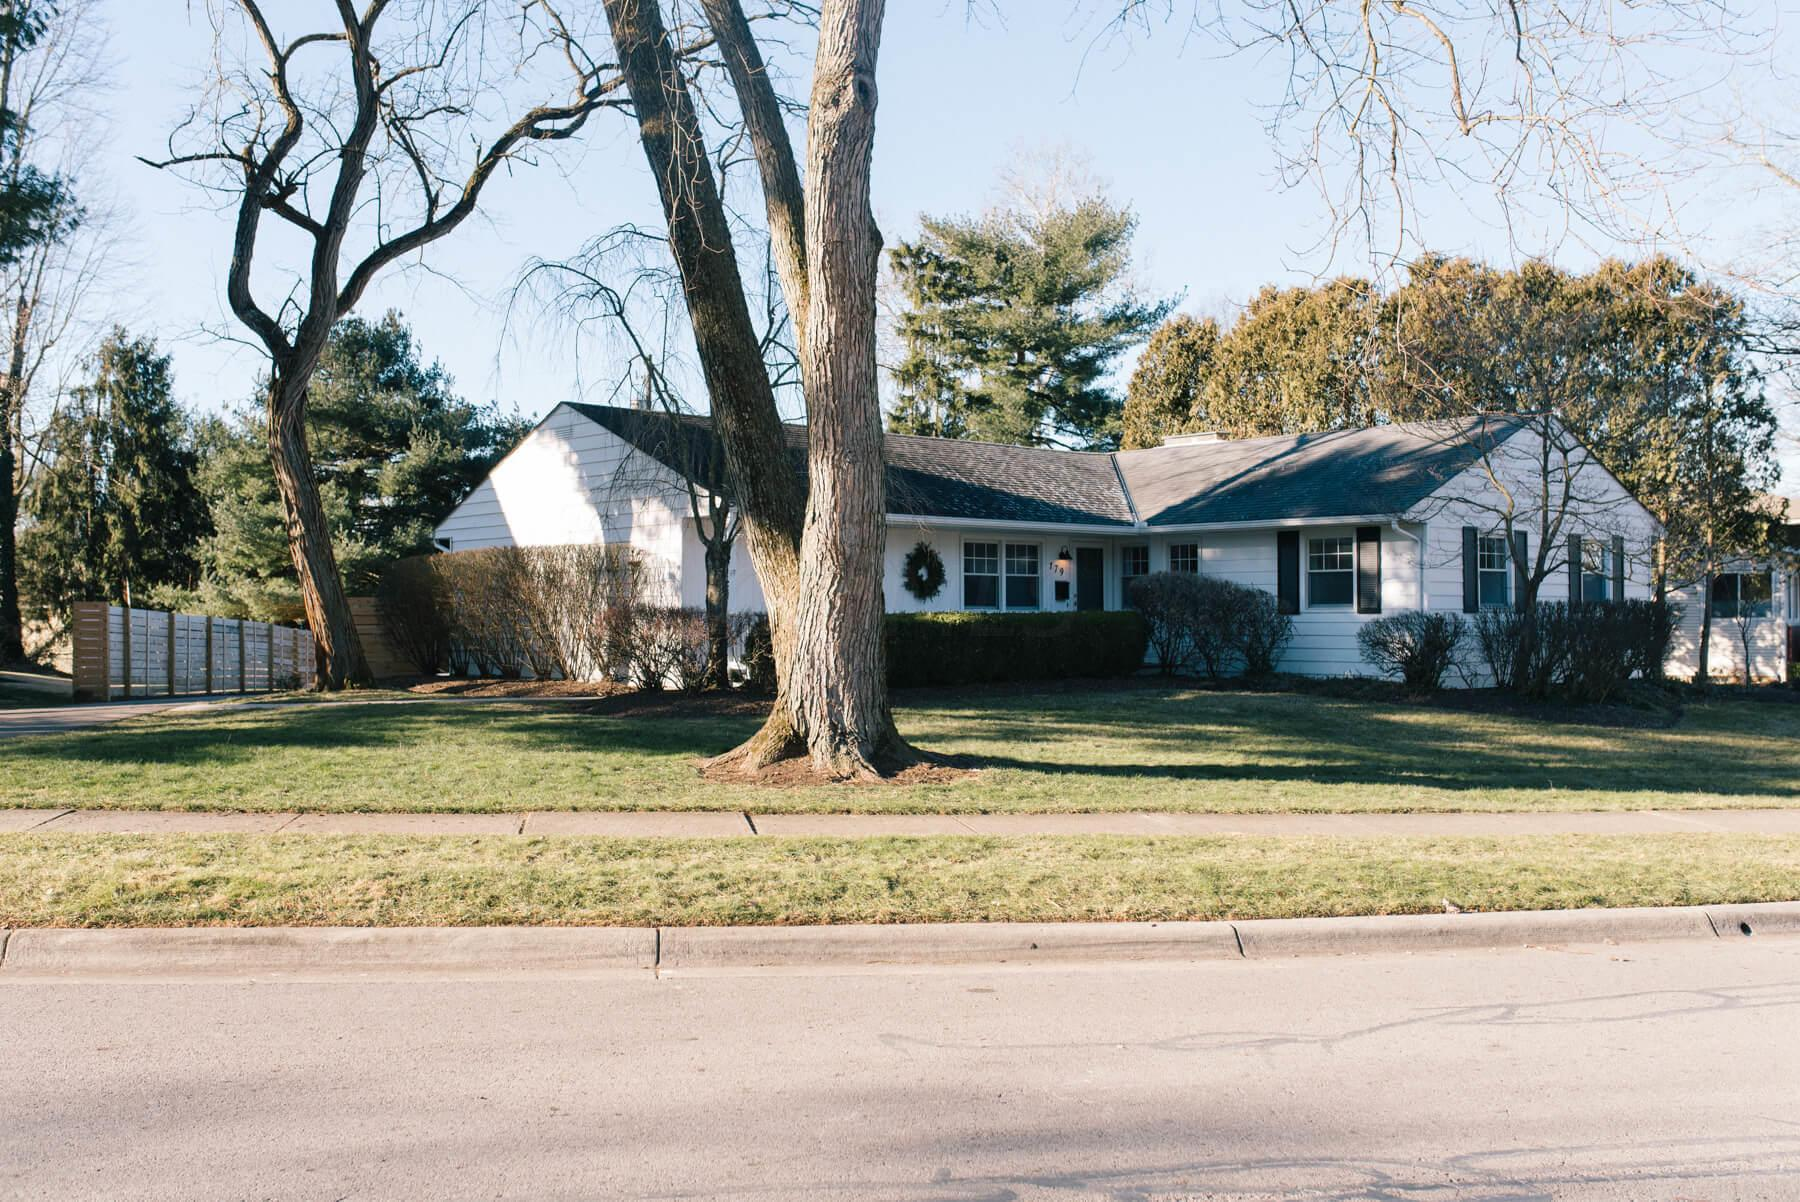 Photo of 179 Sinsbury Drive N, Worthington, OH 43085